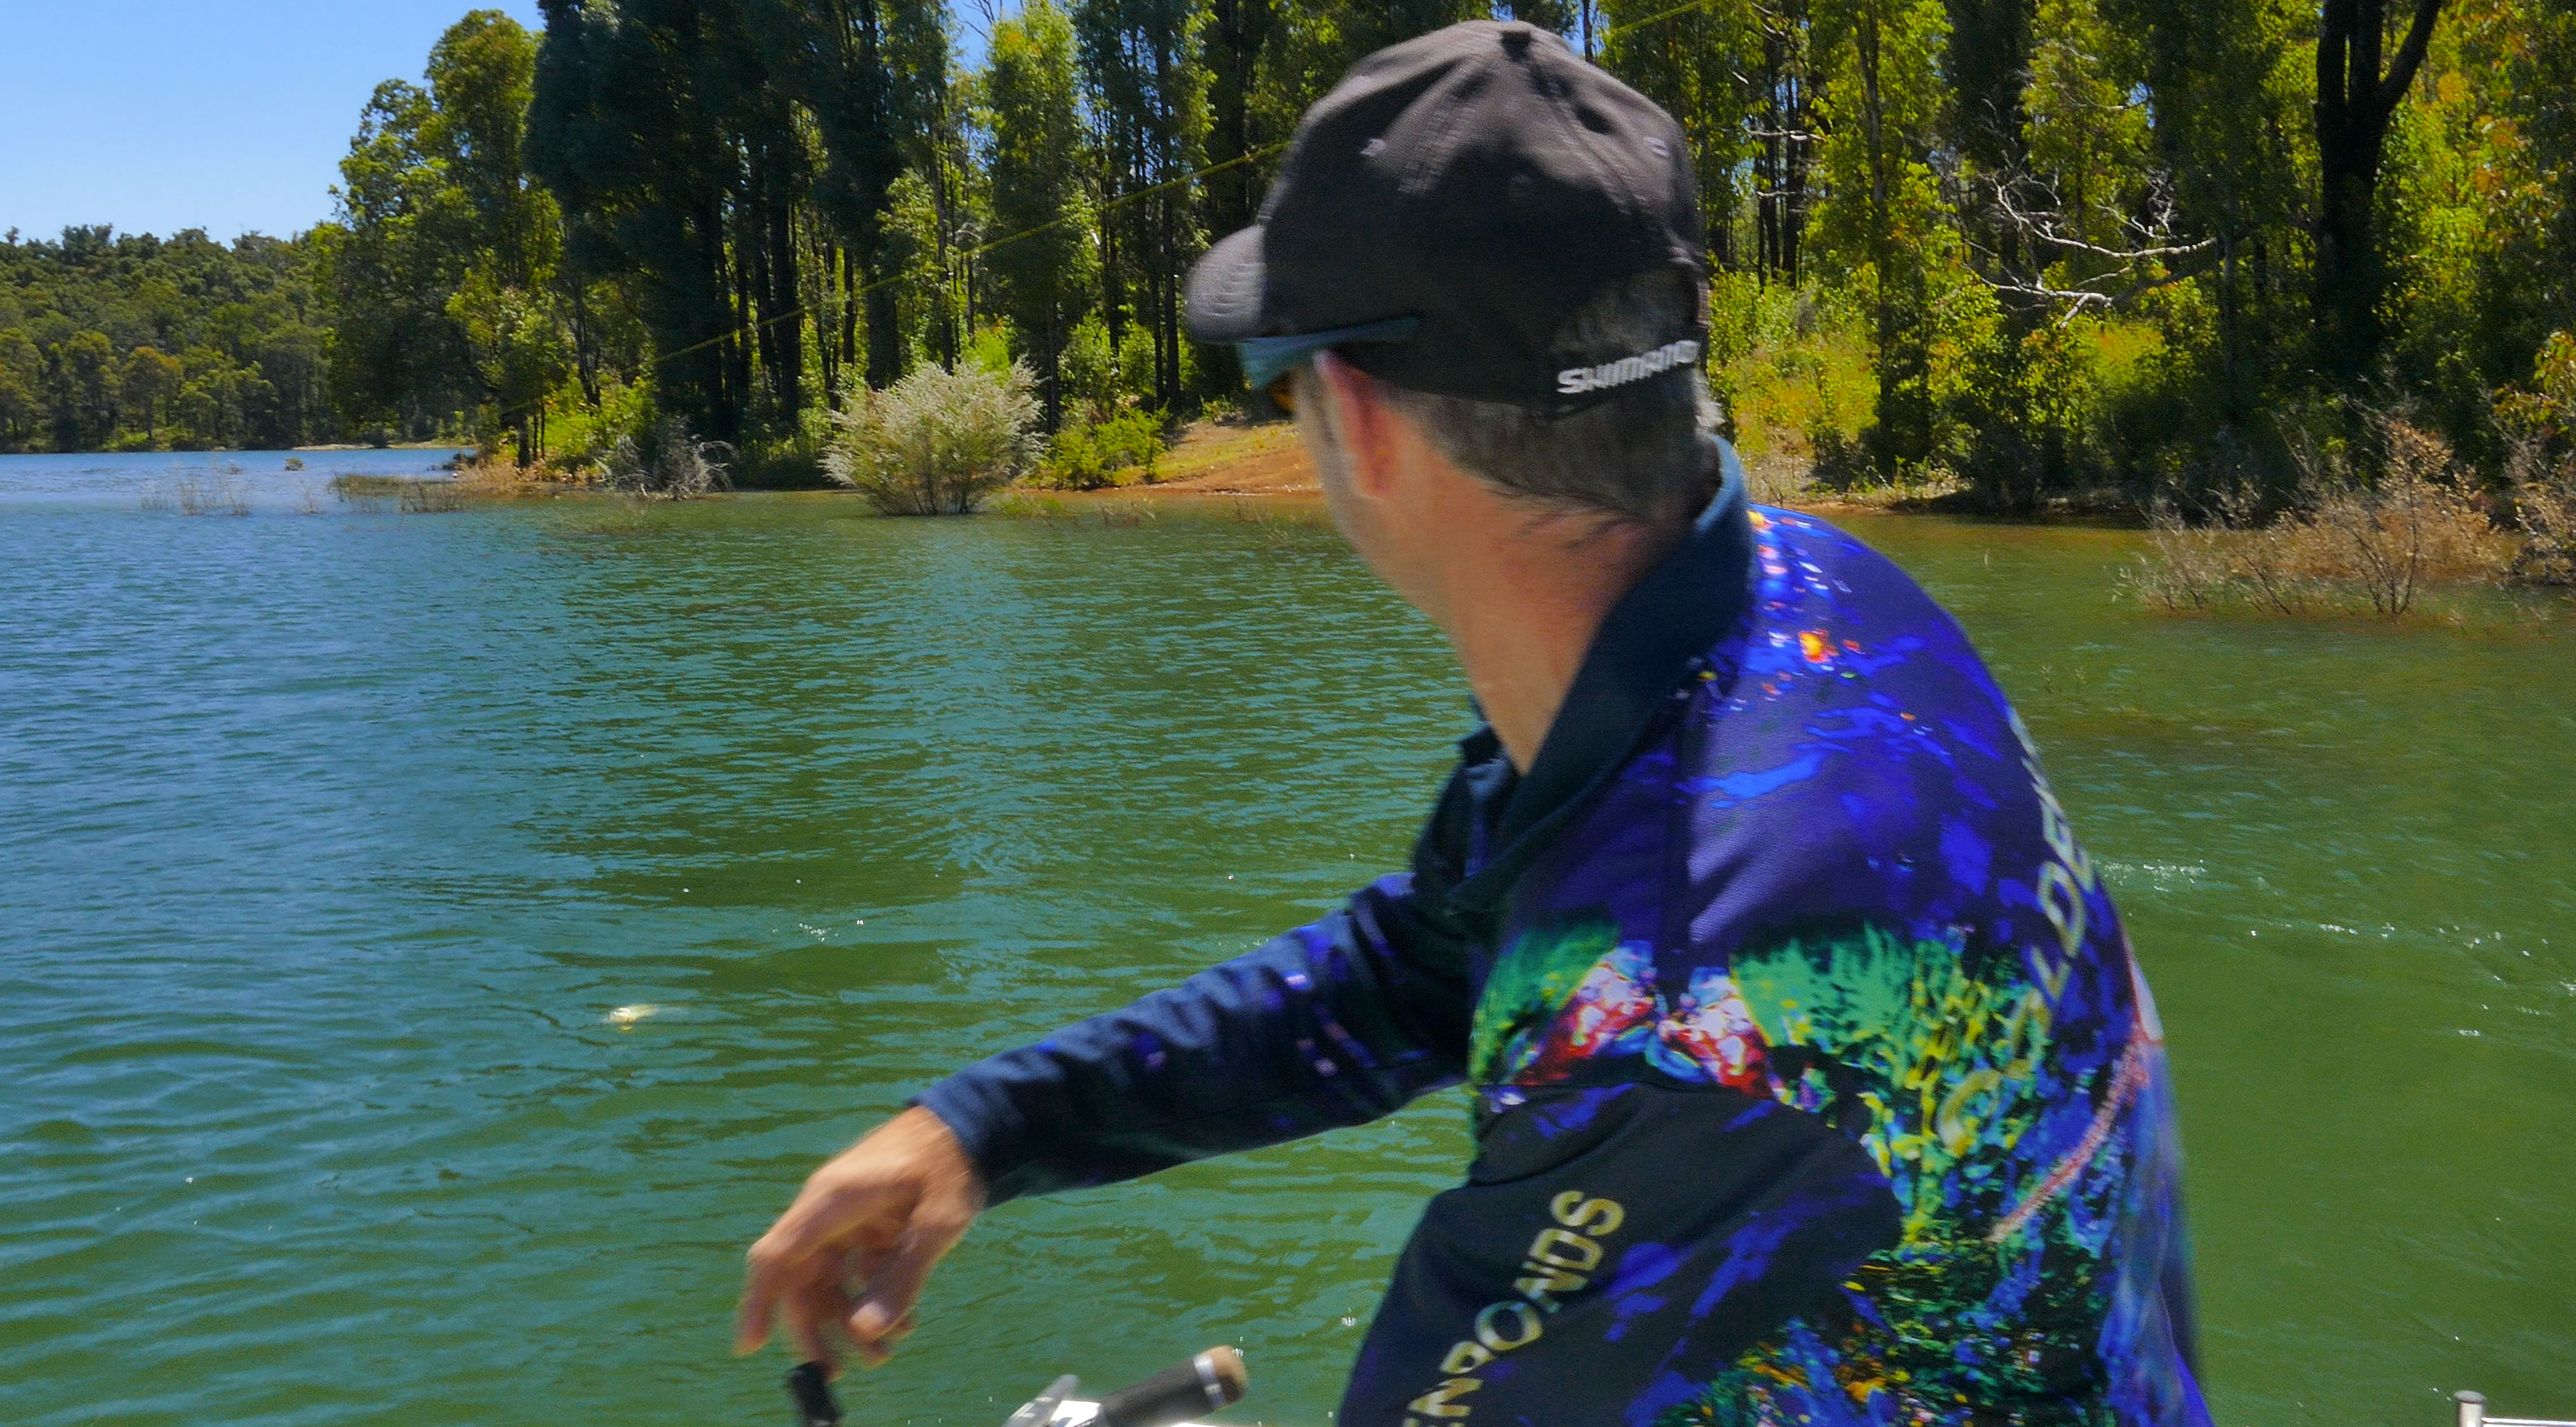 Nick Hocking at Waroona Dam